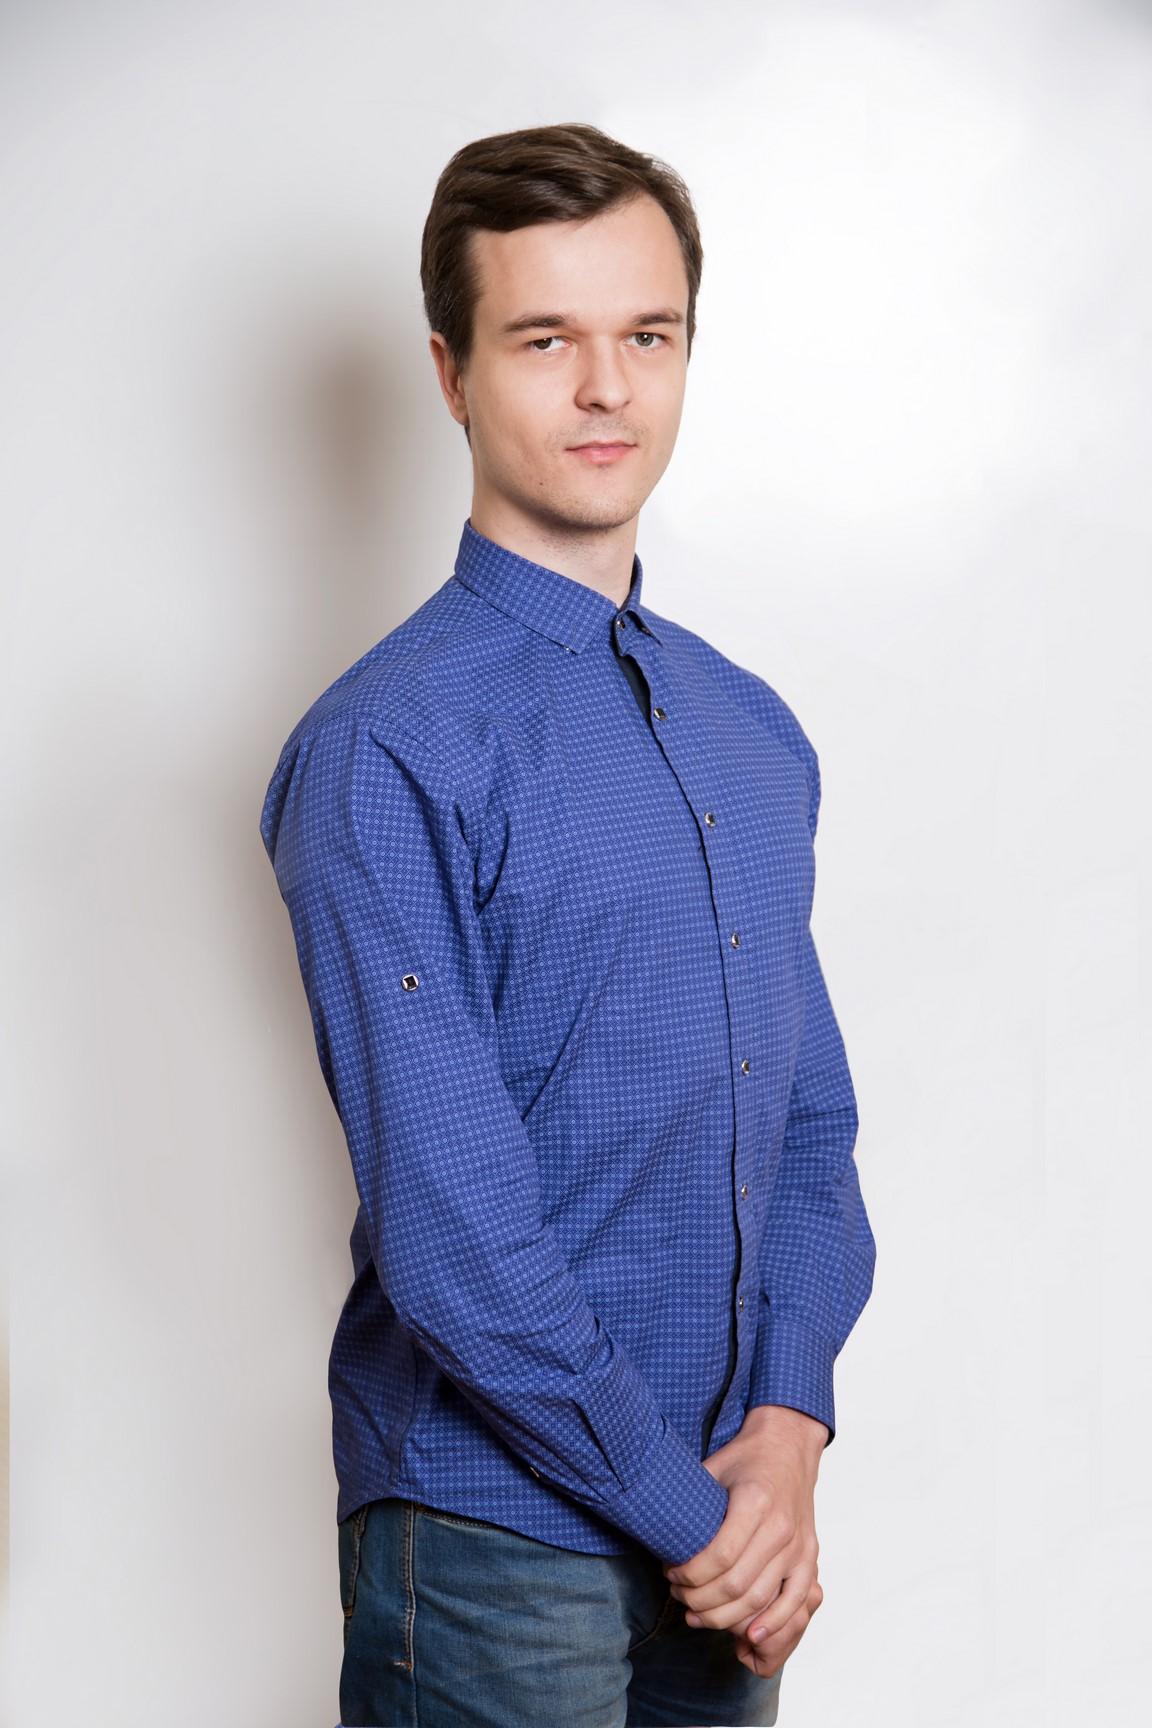 Шаповалов Юрий